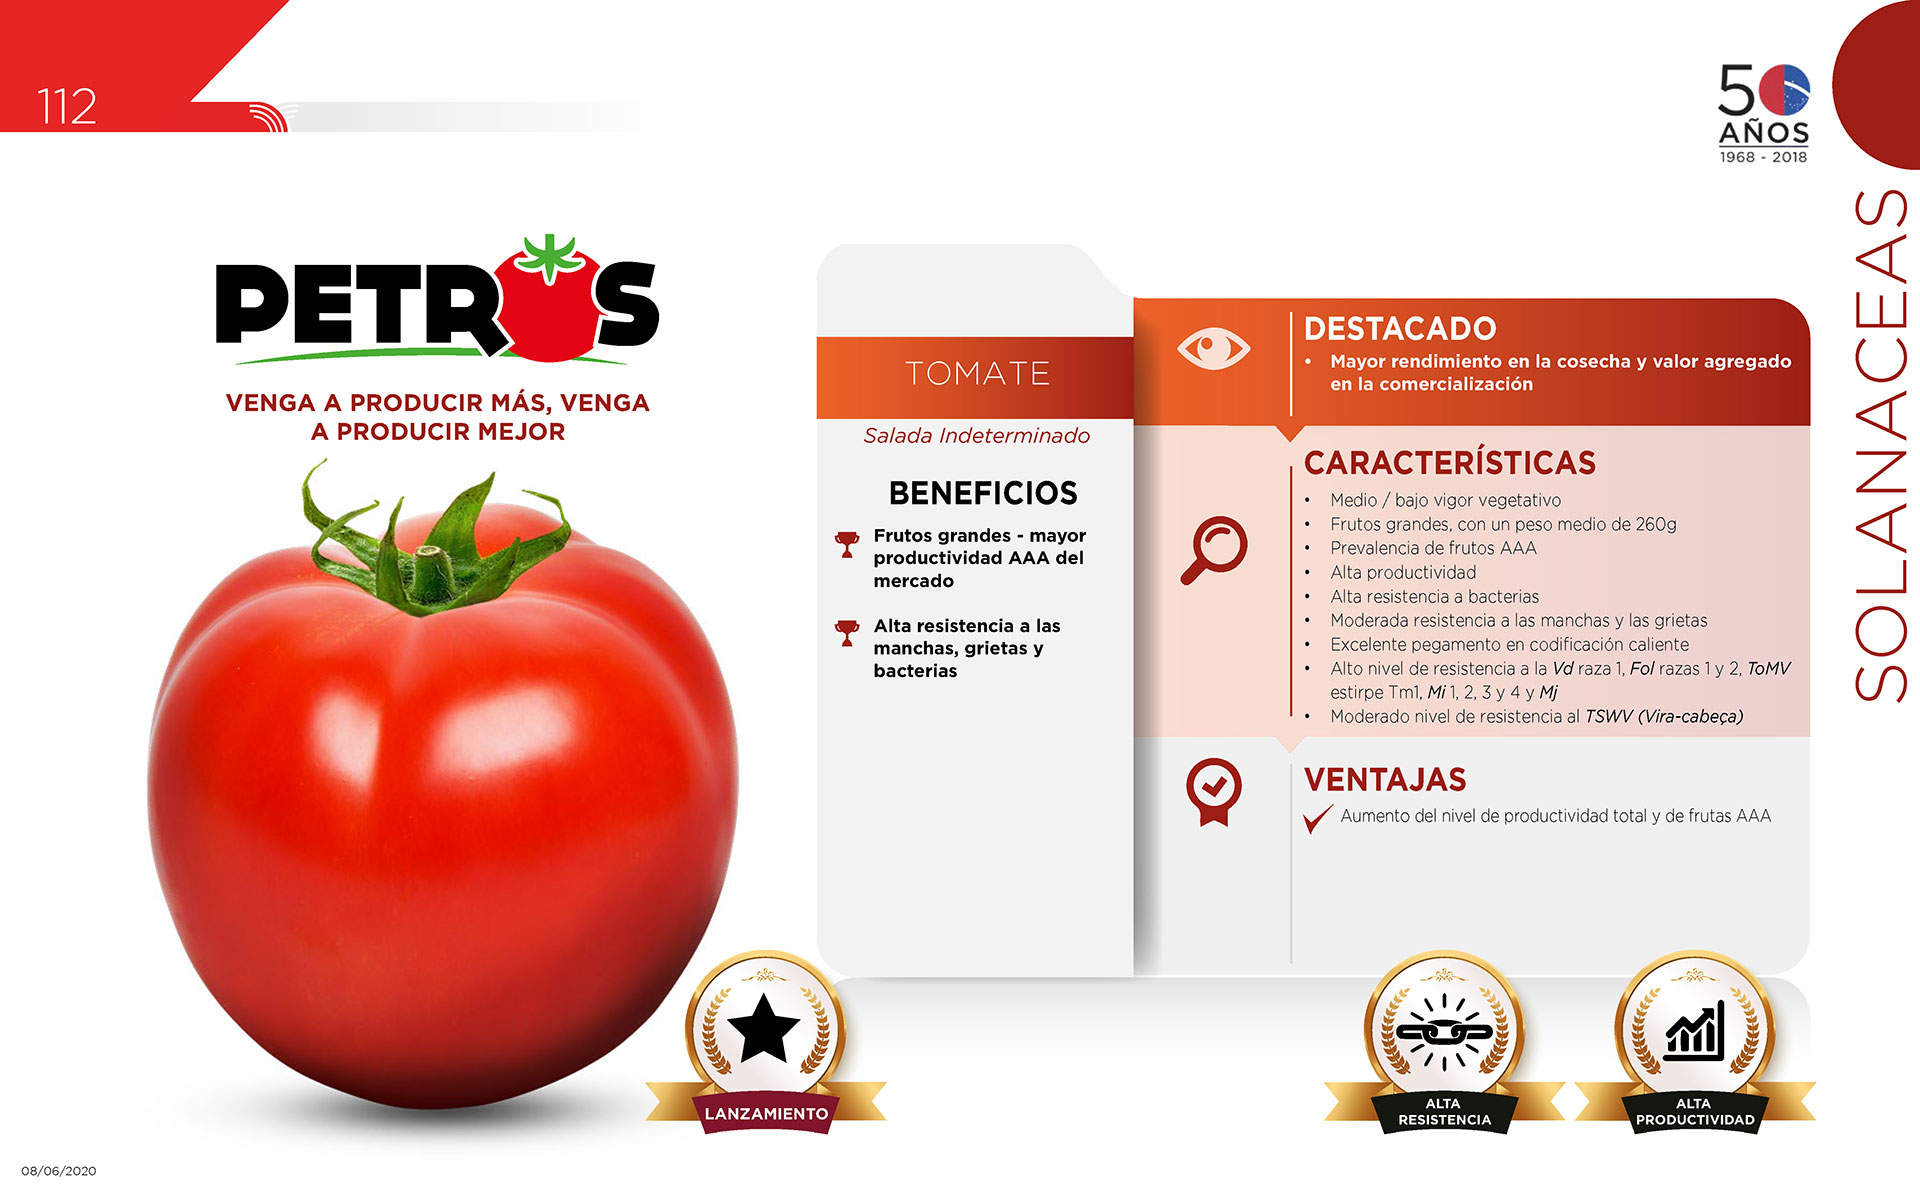 Petros - Solanaceas